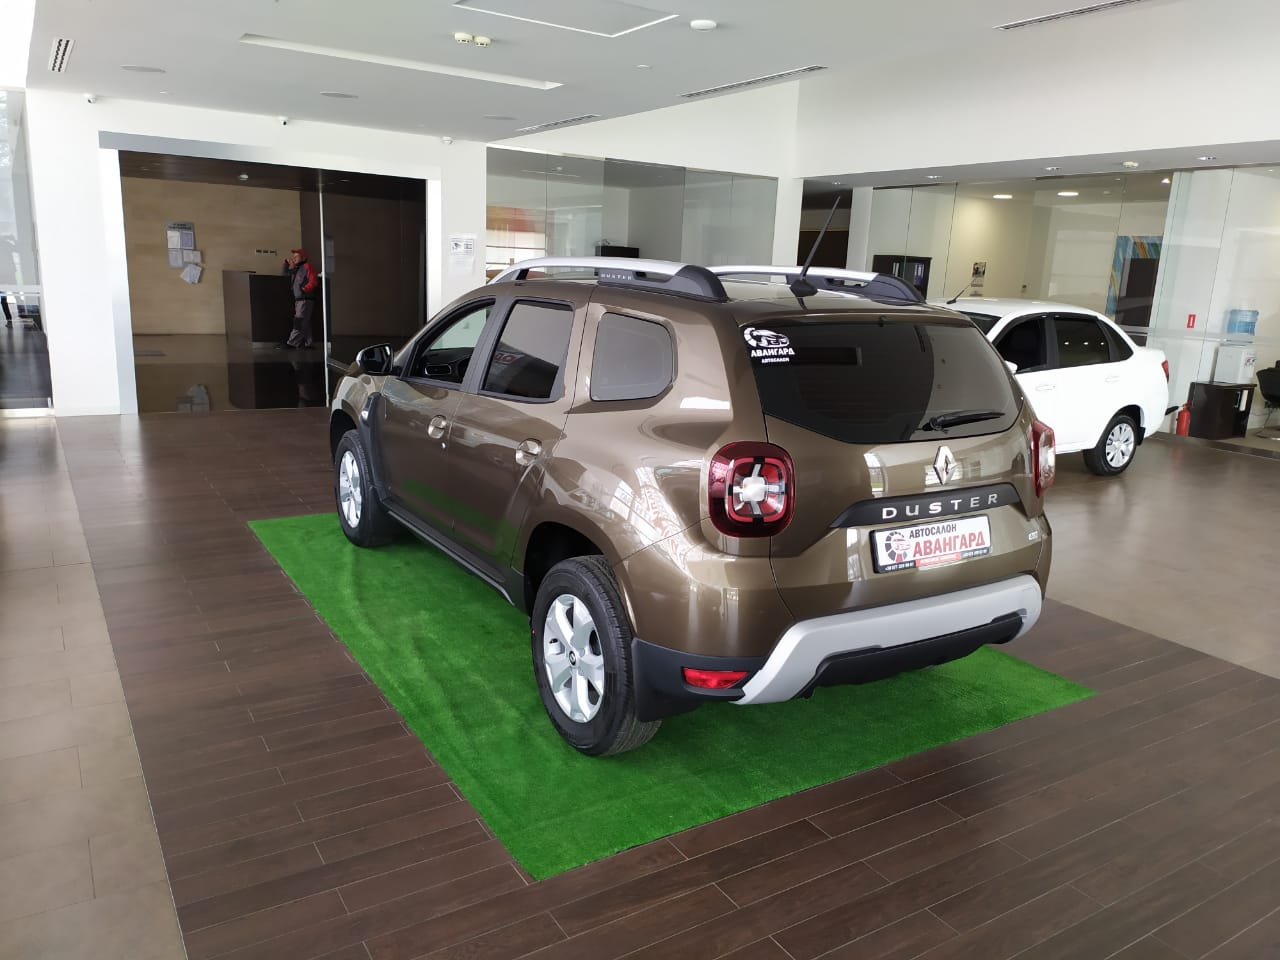 НОВЫЙ RENAULT DUSTER 1.6 л 16 кл. МКП6, Drive 4х4, Серо-коричневый металлик Tenakuru, новинка 2021